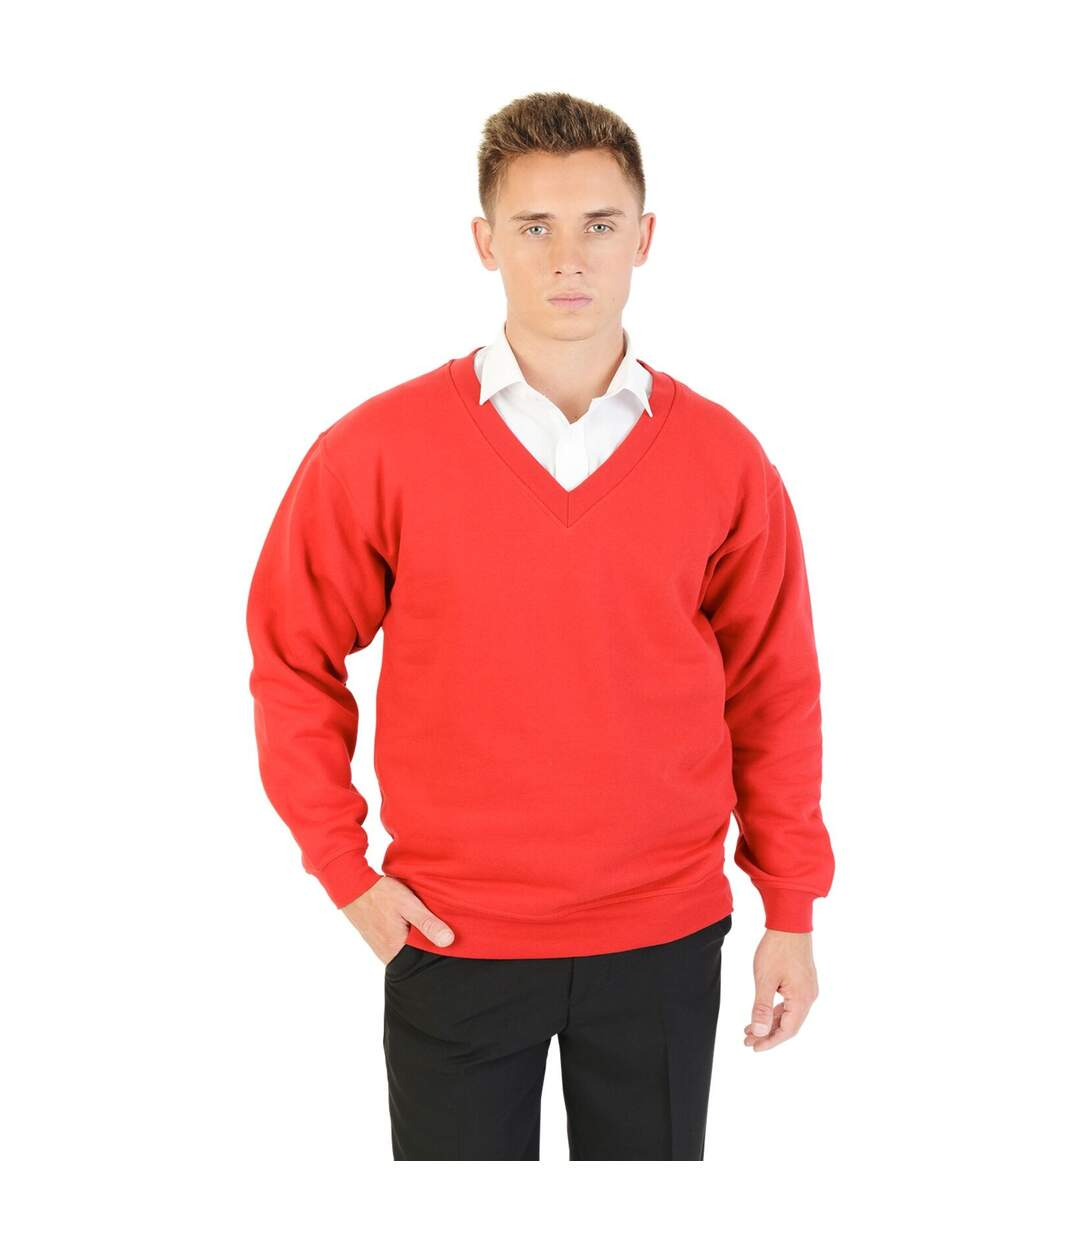 Absolute Apparel Mens V Neck Sweat (Red) - UTAB116